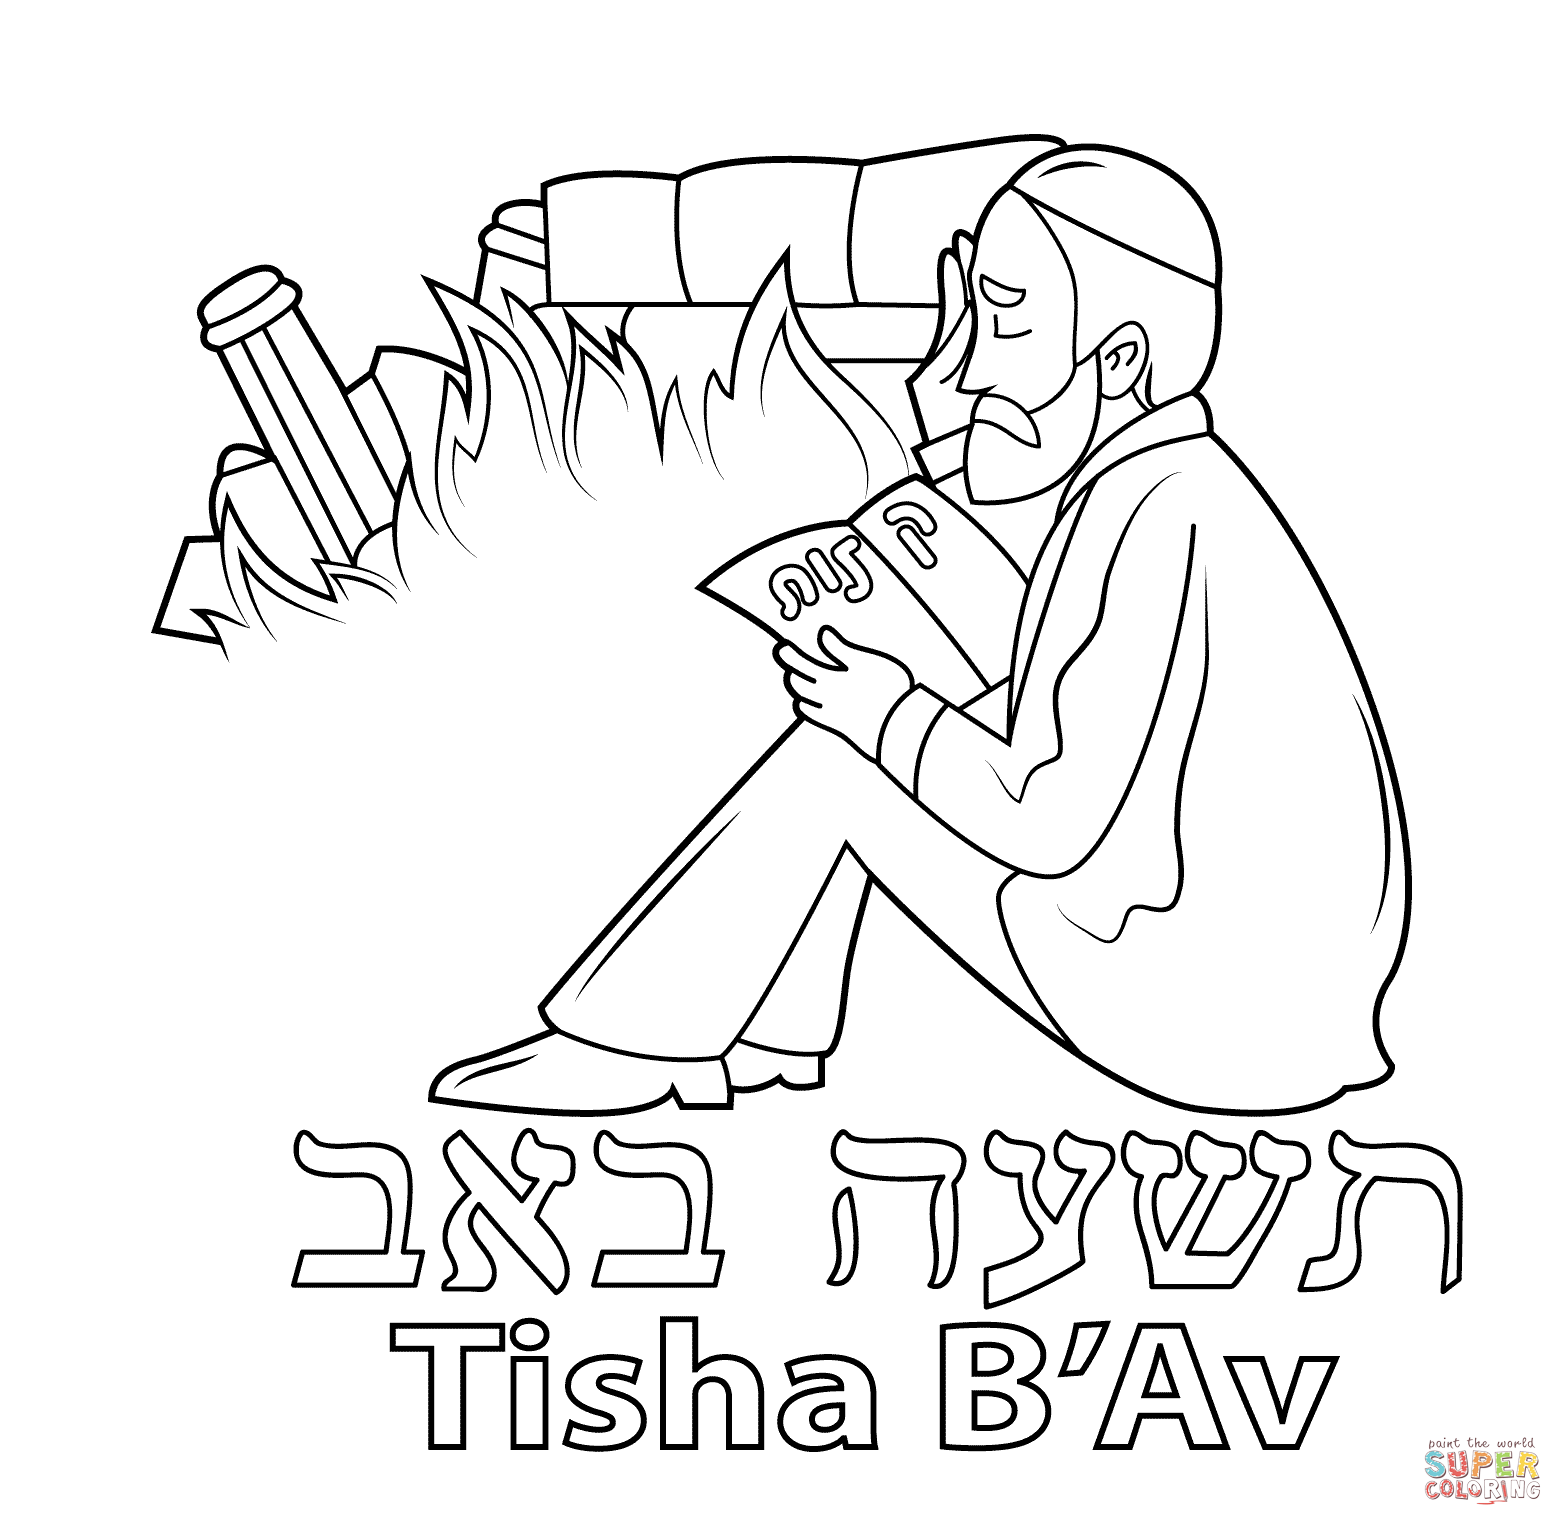 53 Tisha B'Av Wish Pictures And Photos